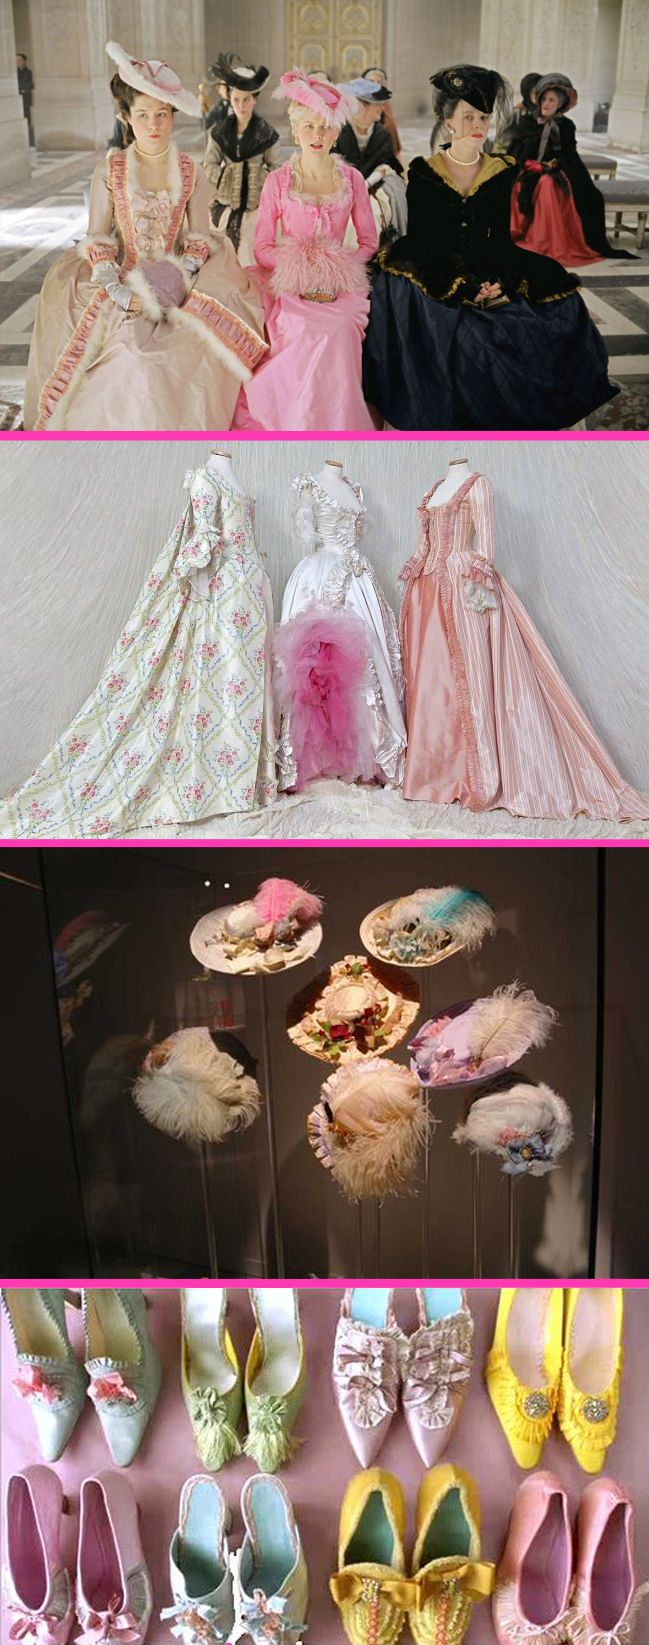 Milena Canonero's costumes for Marie Antoinette (2006).